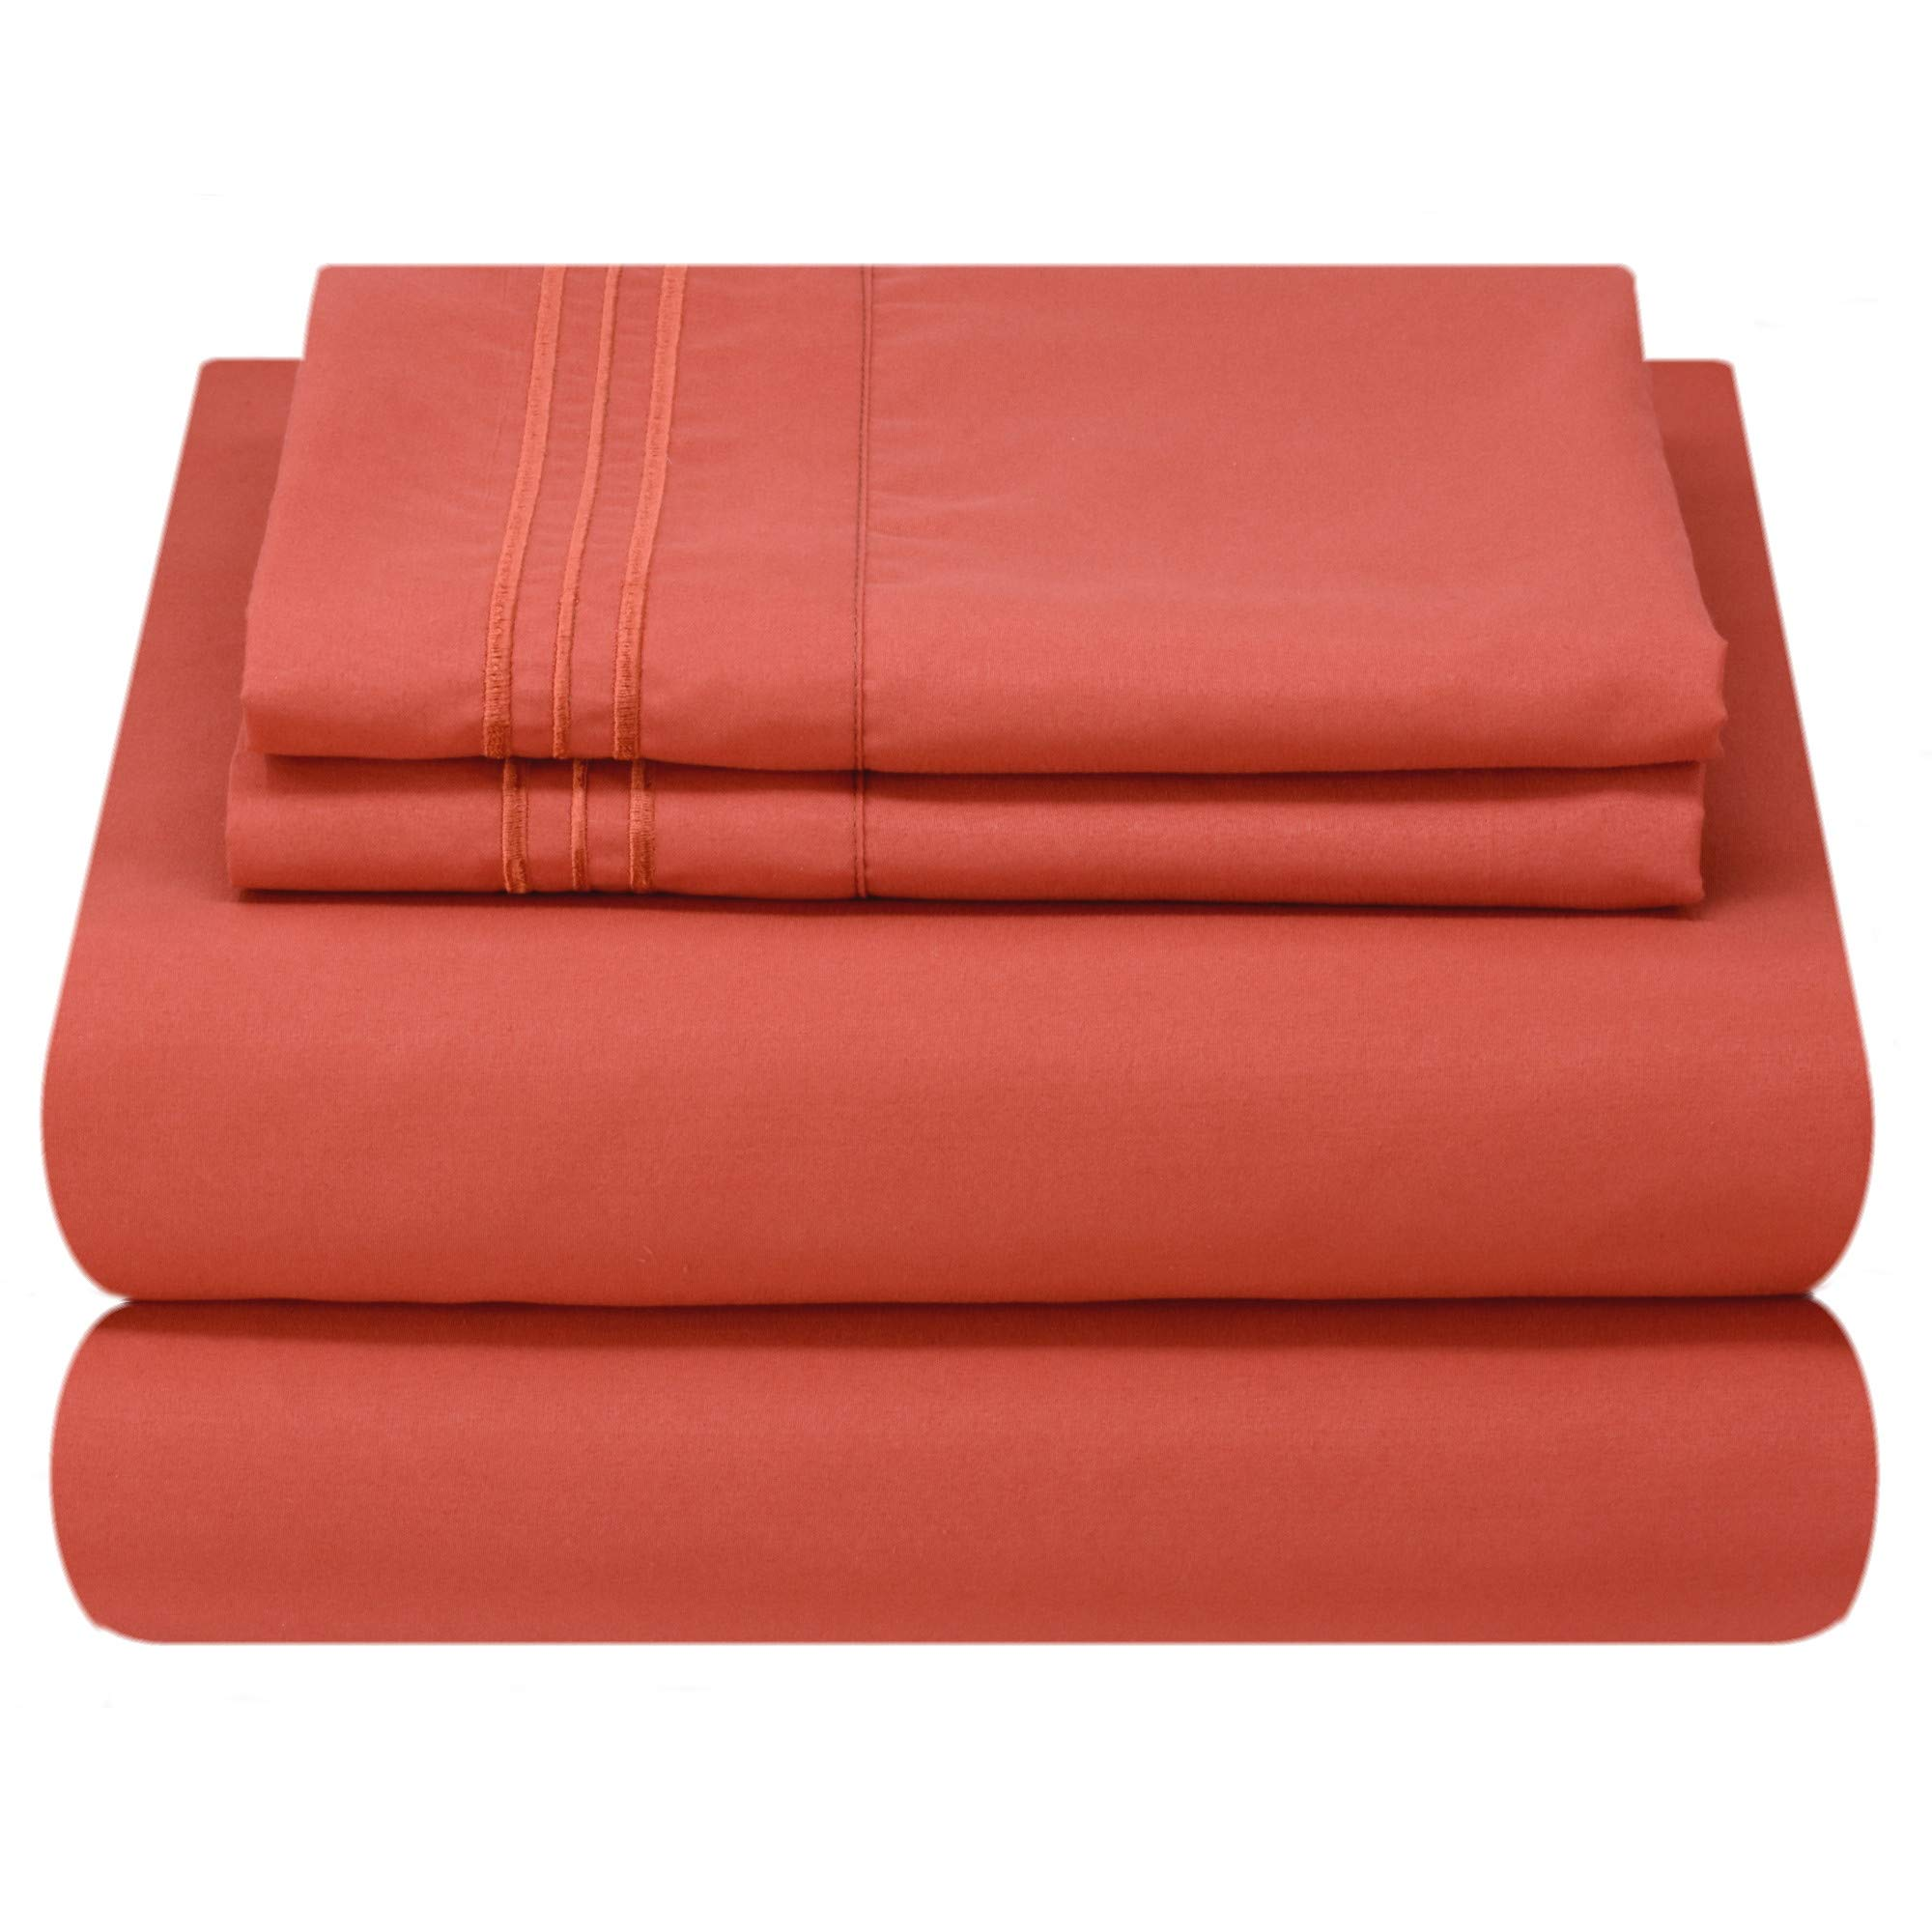 Mezzati Luxury Bed Sheet Set - Soft and Comfortable 1800 Prestige Collection - Brushed Microfiber Bedding (Orange Rust, Full Size)